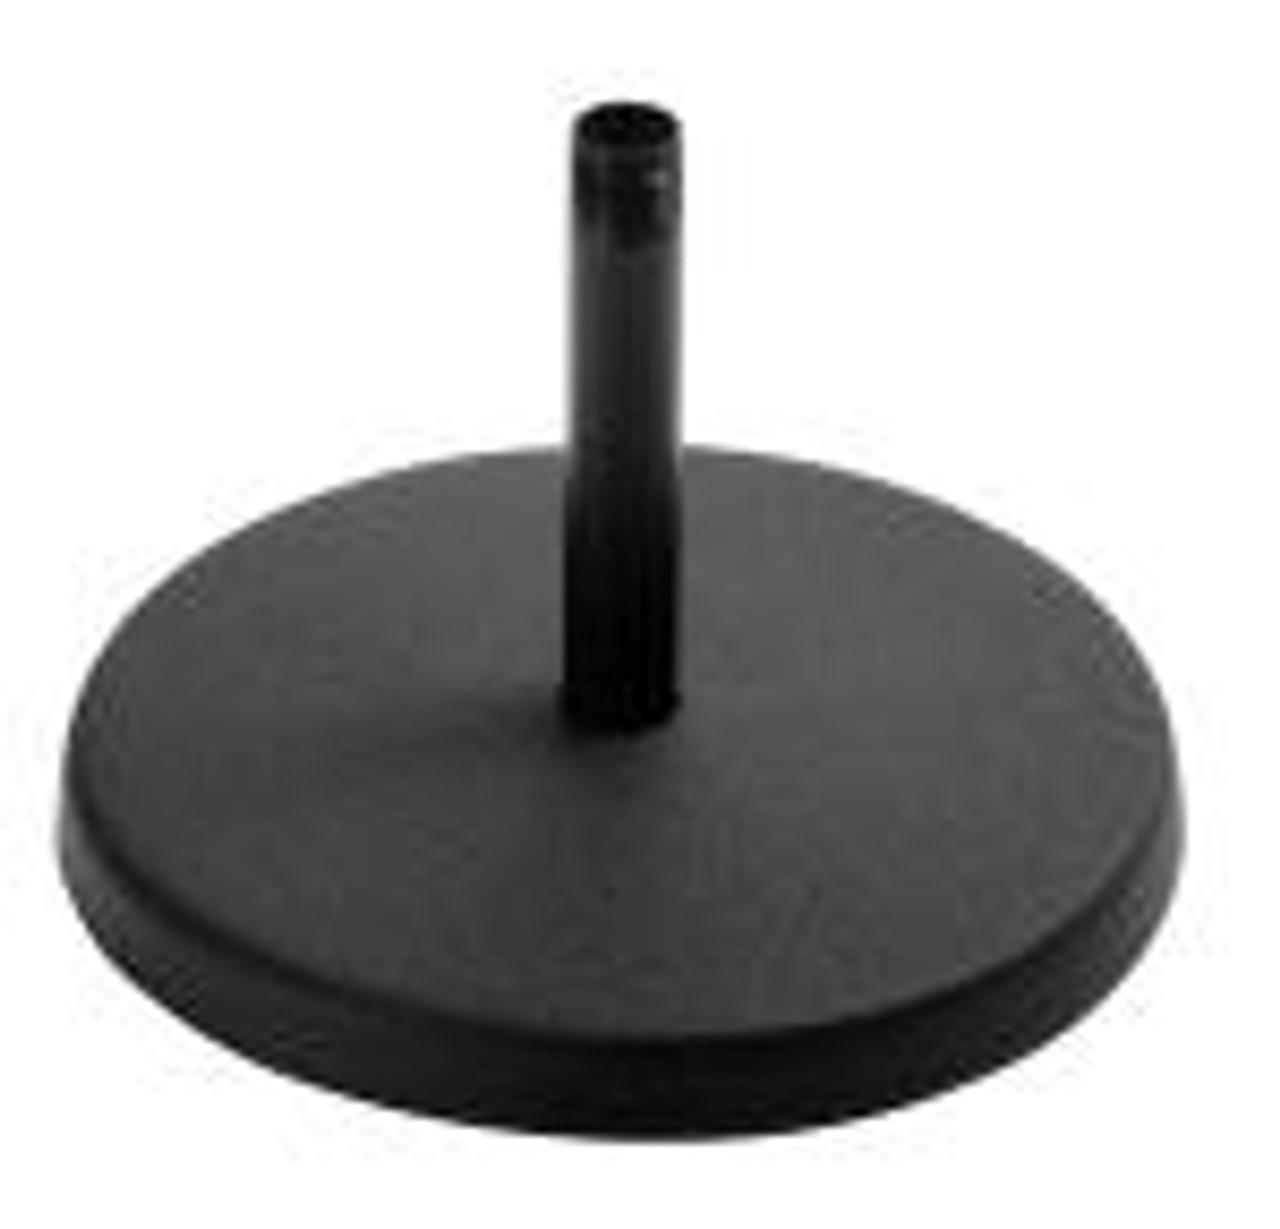 Desk Stand -  Black  -  SPECIAL